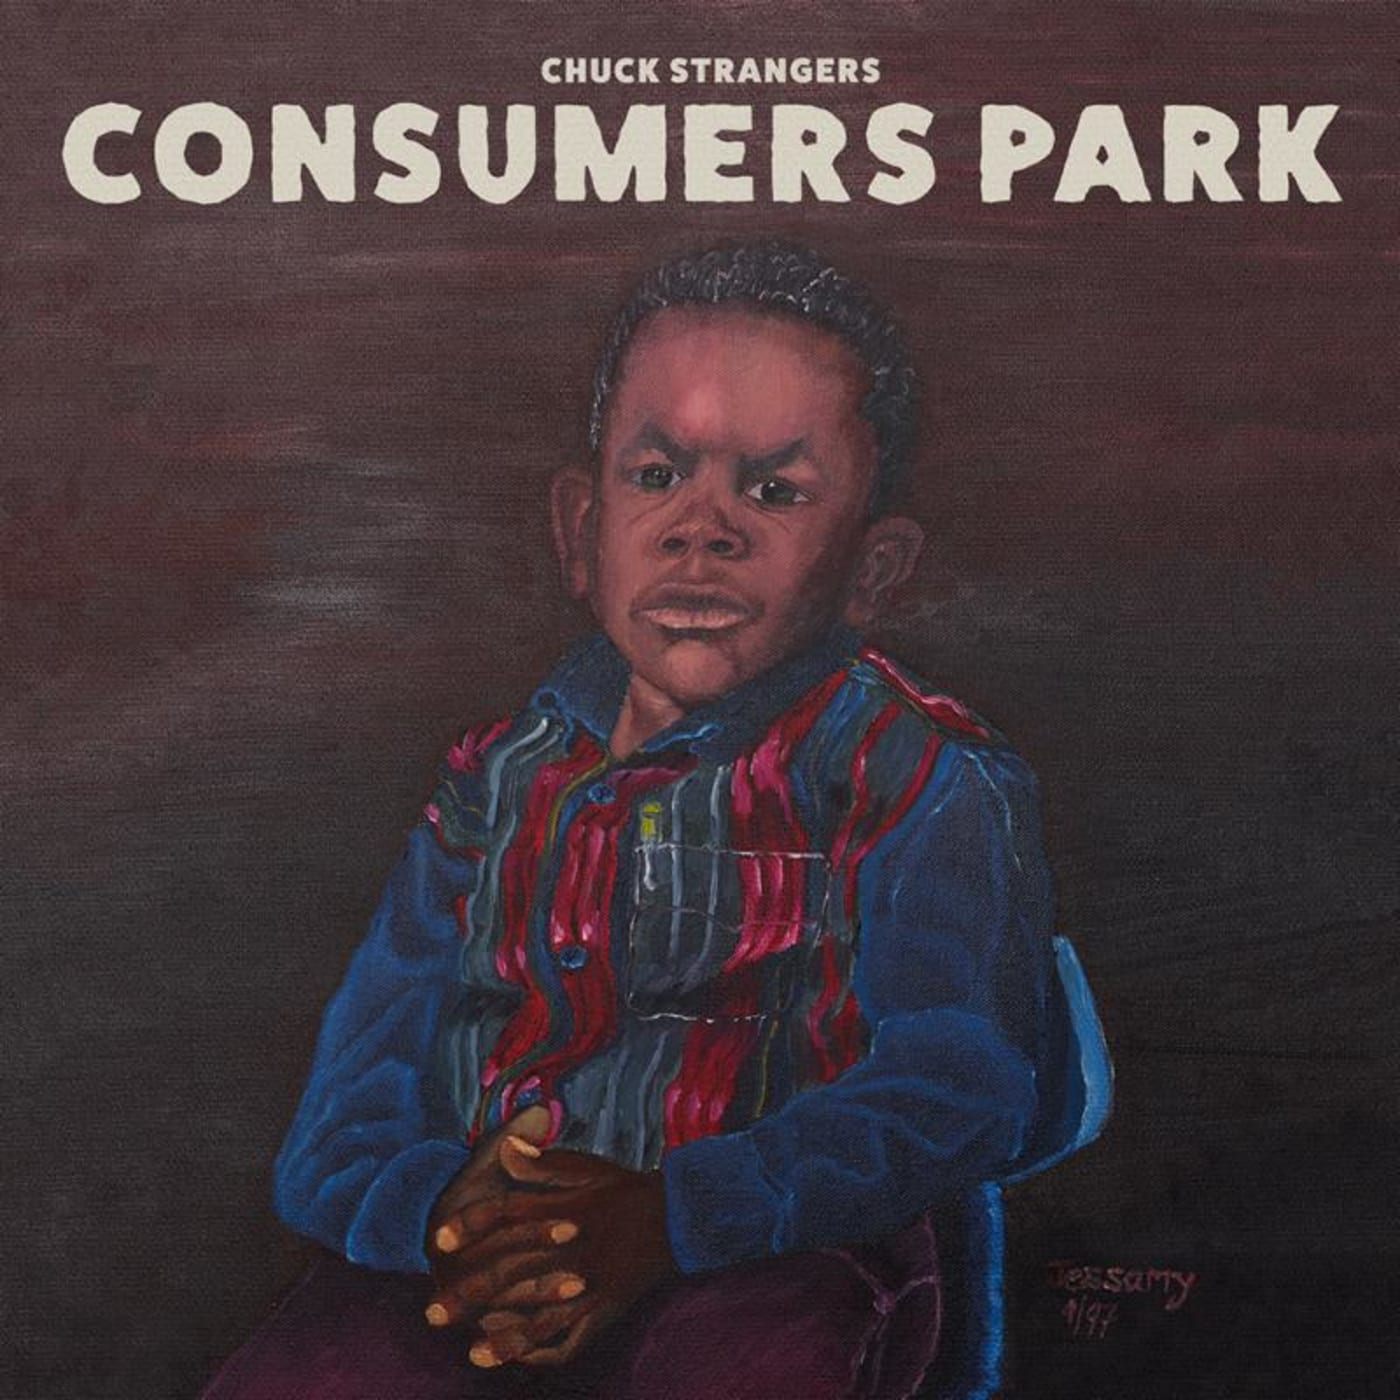 chuck strangers consumers park artwork